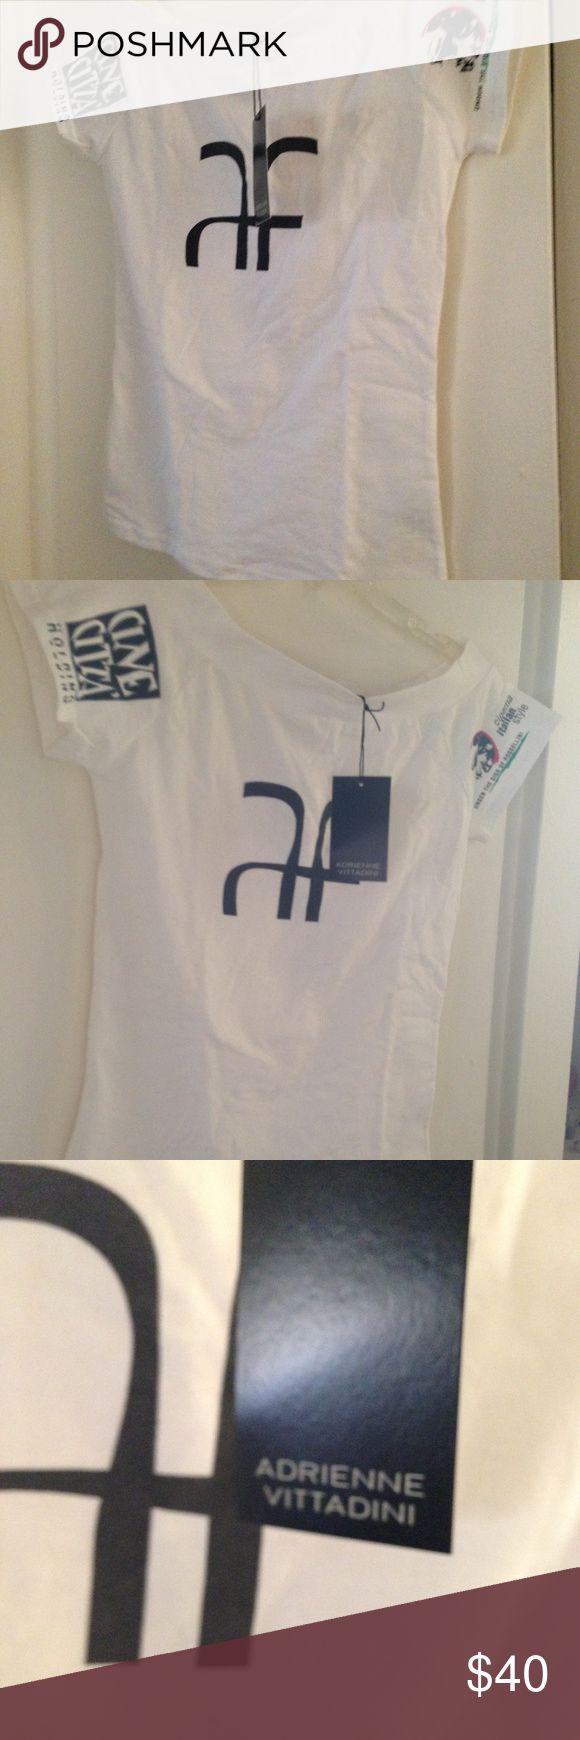 Alberta Ferretti for Cinecita Holdings Medium NEW! Alberta Ferretti for Cinecita Holdings Medium white shirt with logo for Italian Cinema style event. Limited edition Shirt Size Medium Stretchy cotton Alberta Ferretti Tops Tees - Short Sleeve